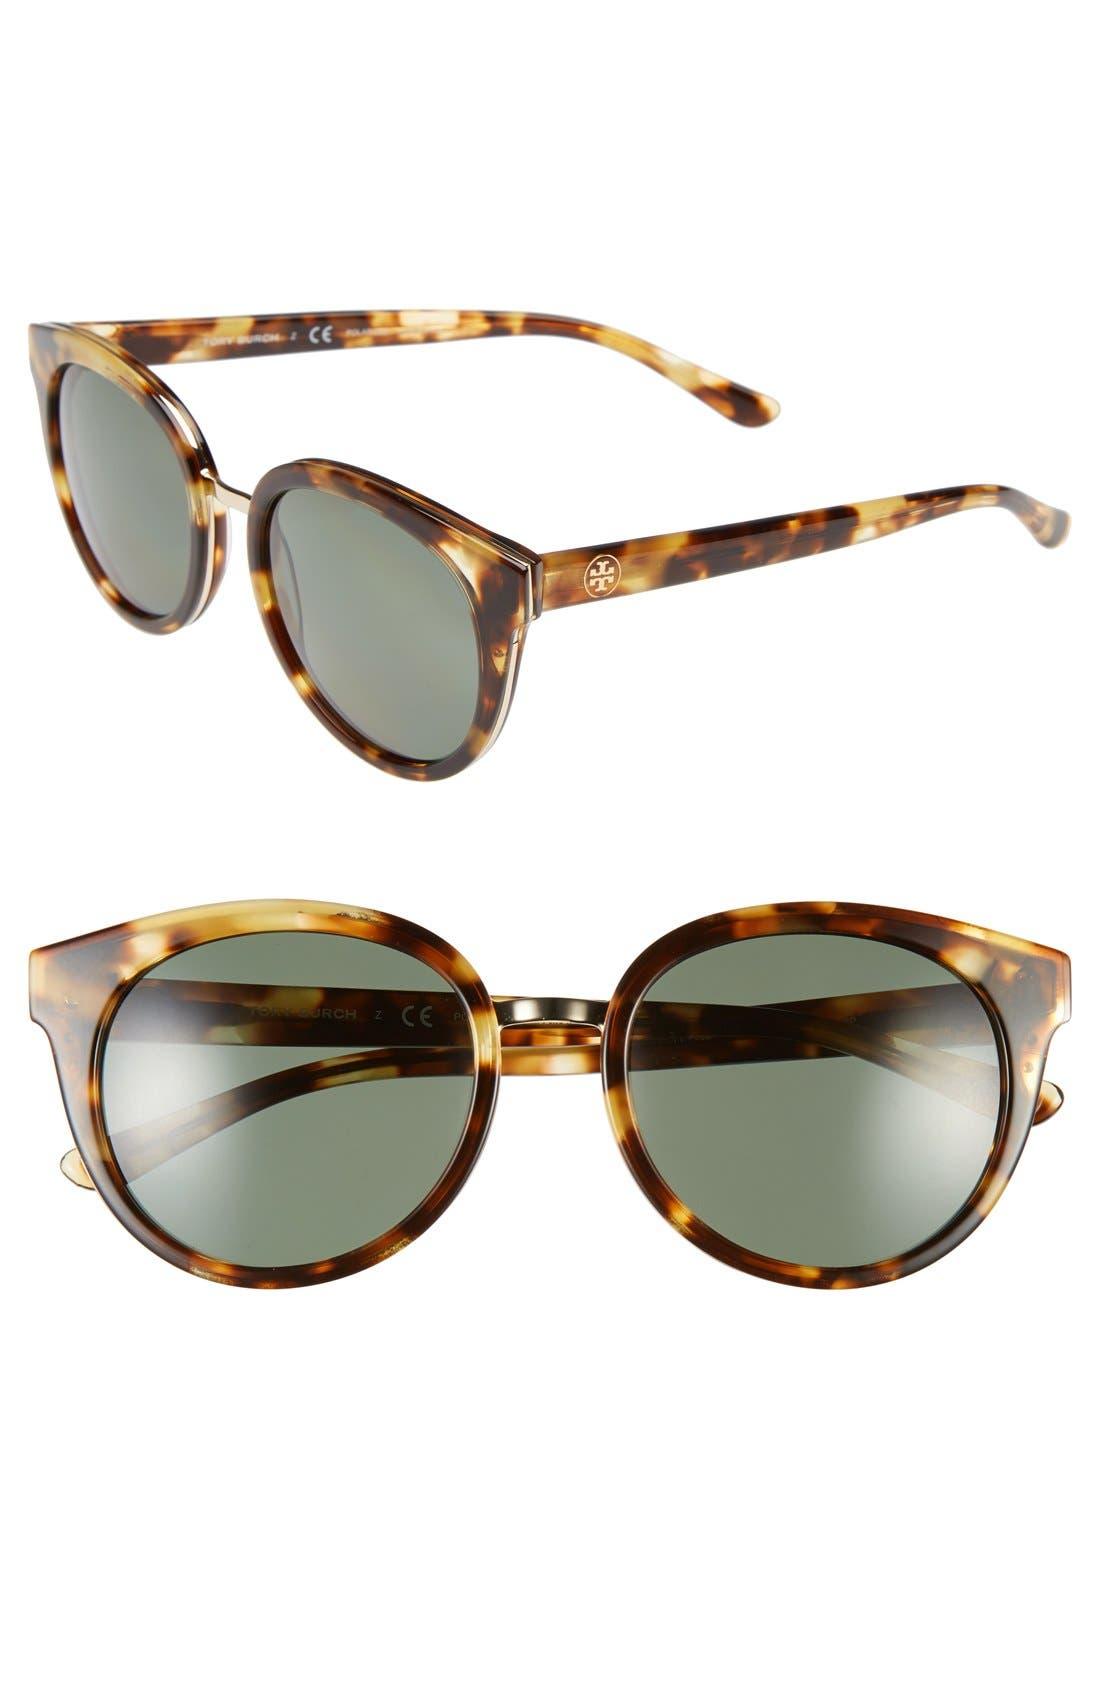 53mm Polarized Retro Sunglasses,                             Main thumbnail 1, color,                             200